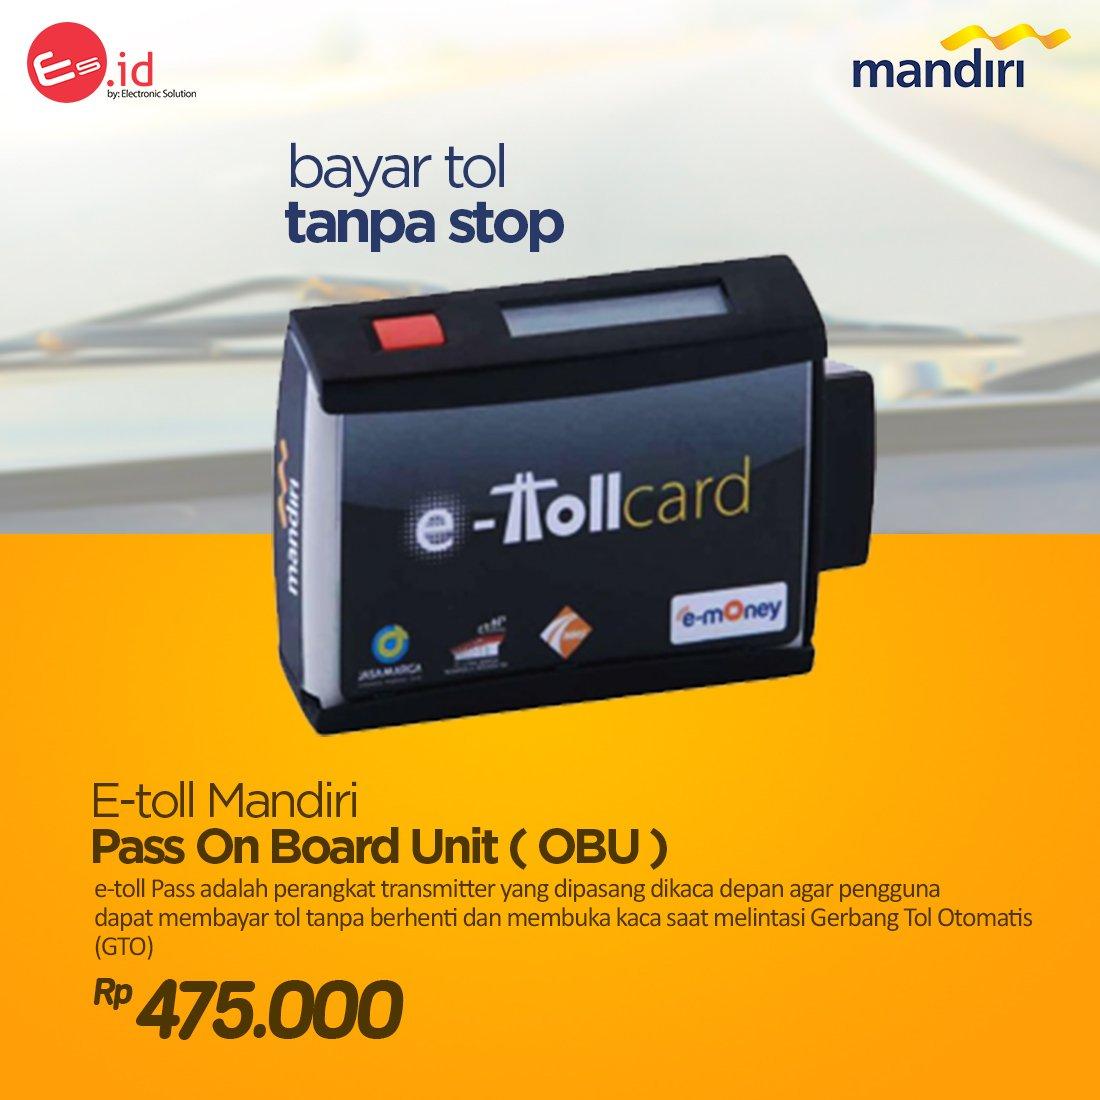 Electronic Solution On Twitter E Toll Mandiri Obu Board Unit 800 Am 26 Jun 2017